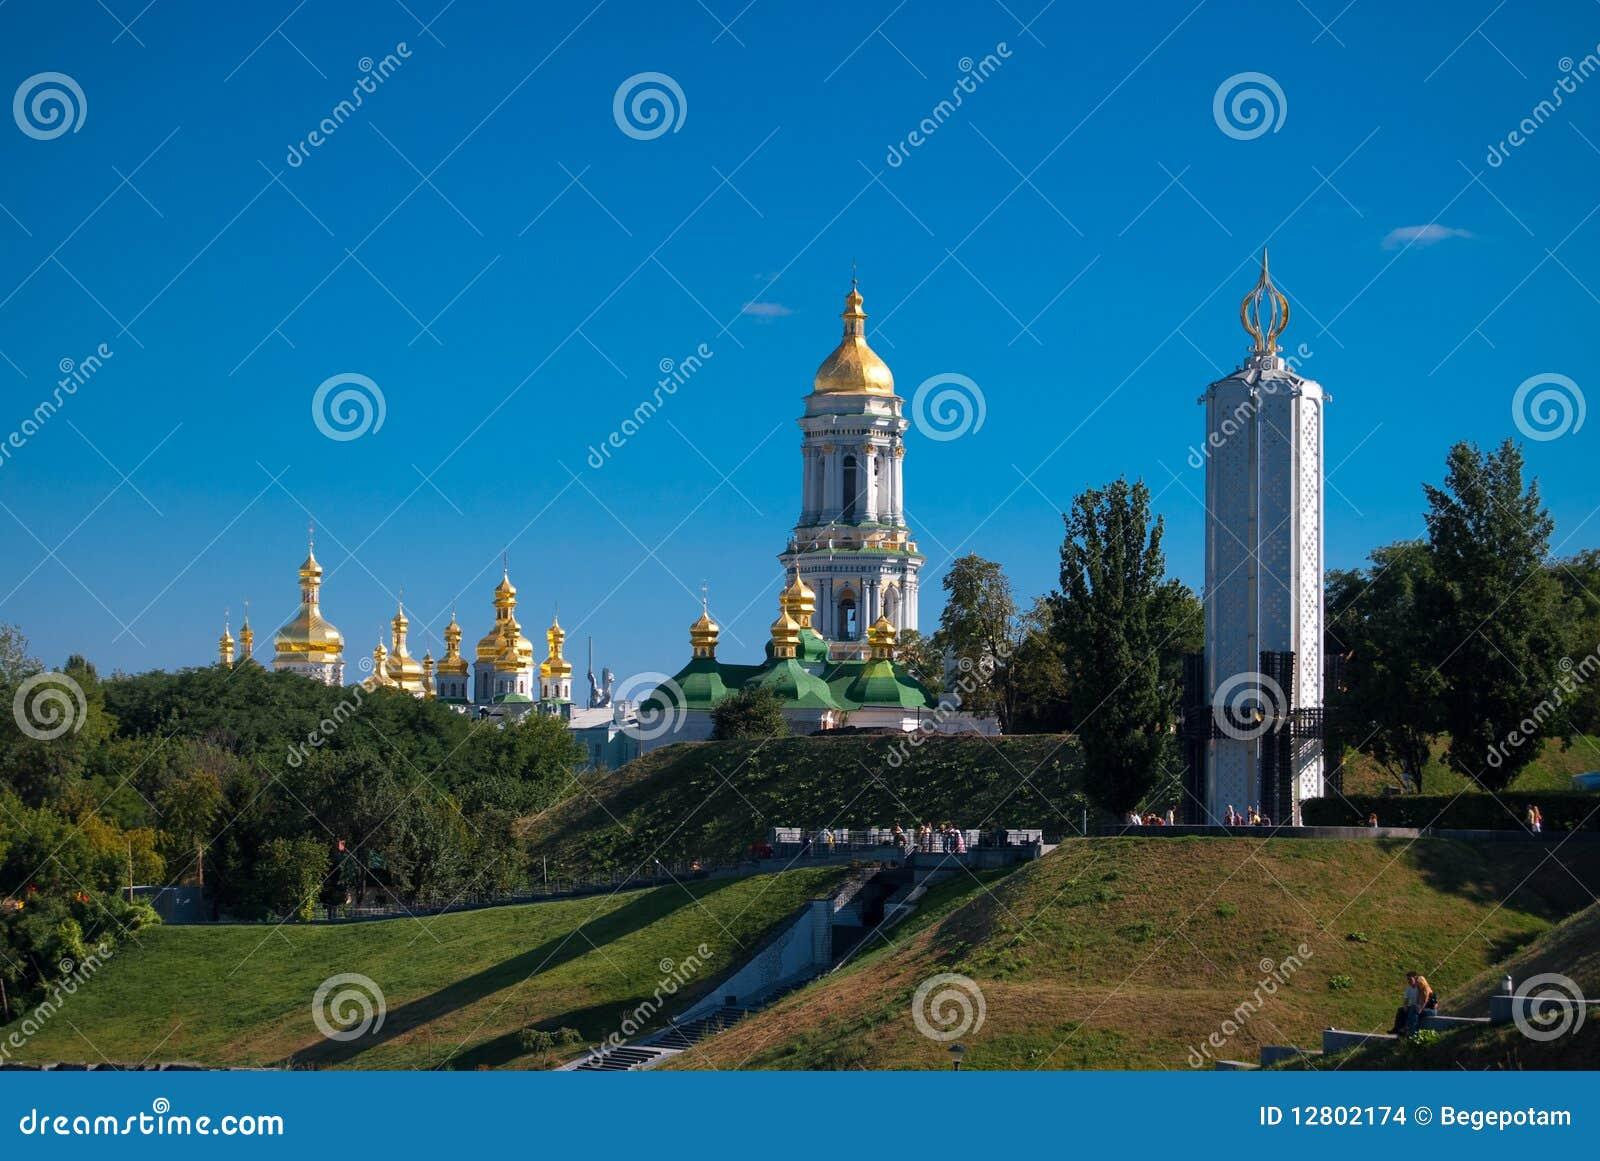 Distrito ortodoxo religioso em Kyiv